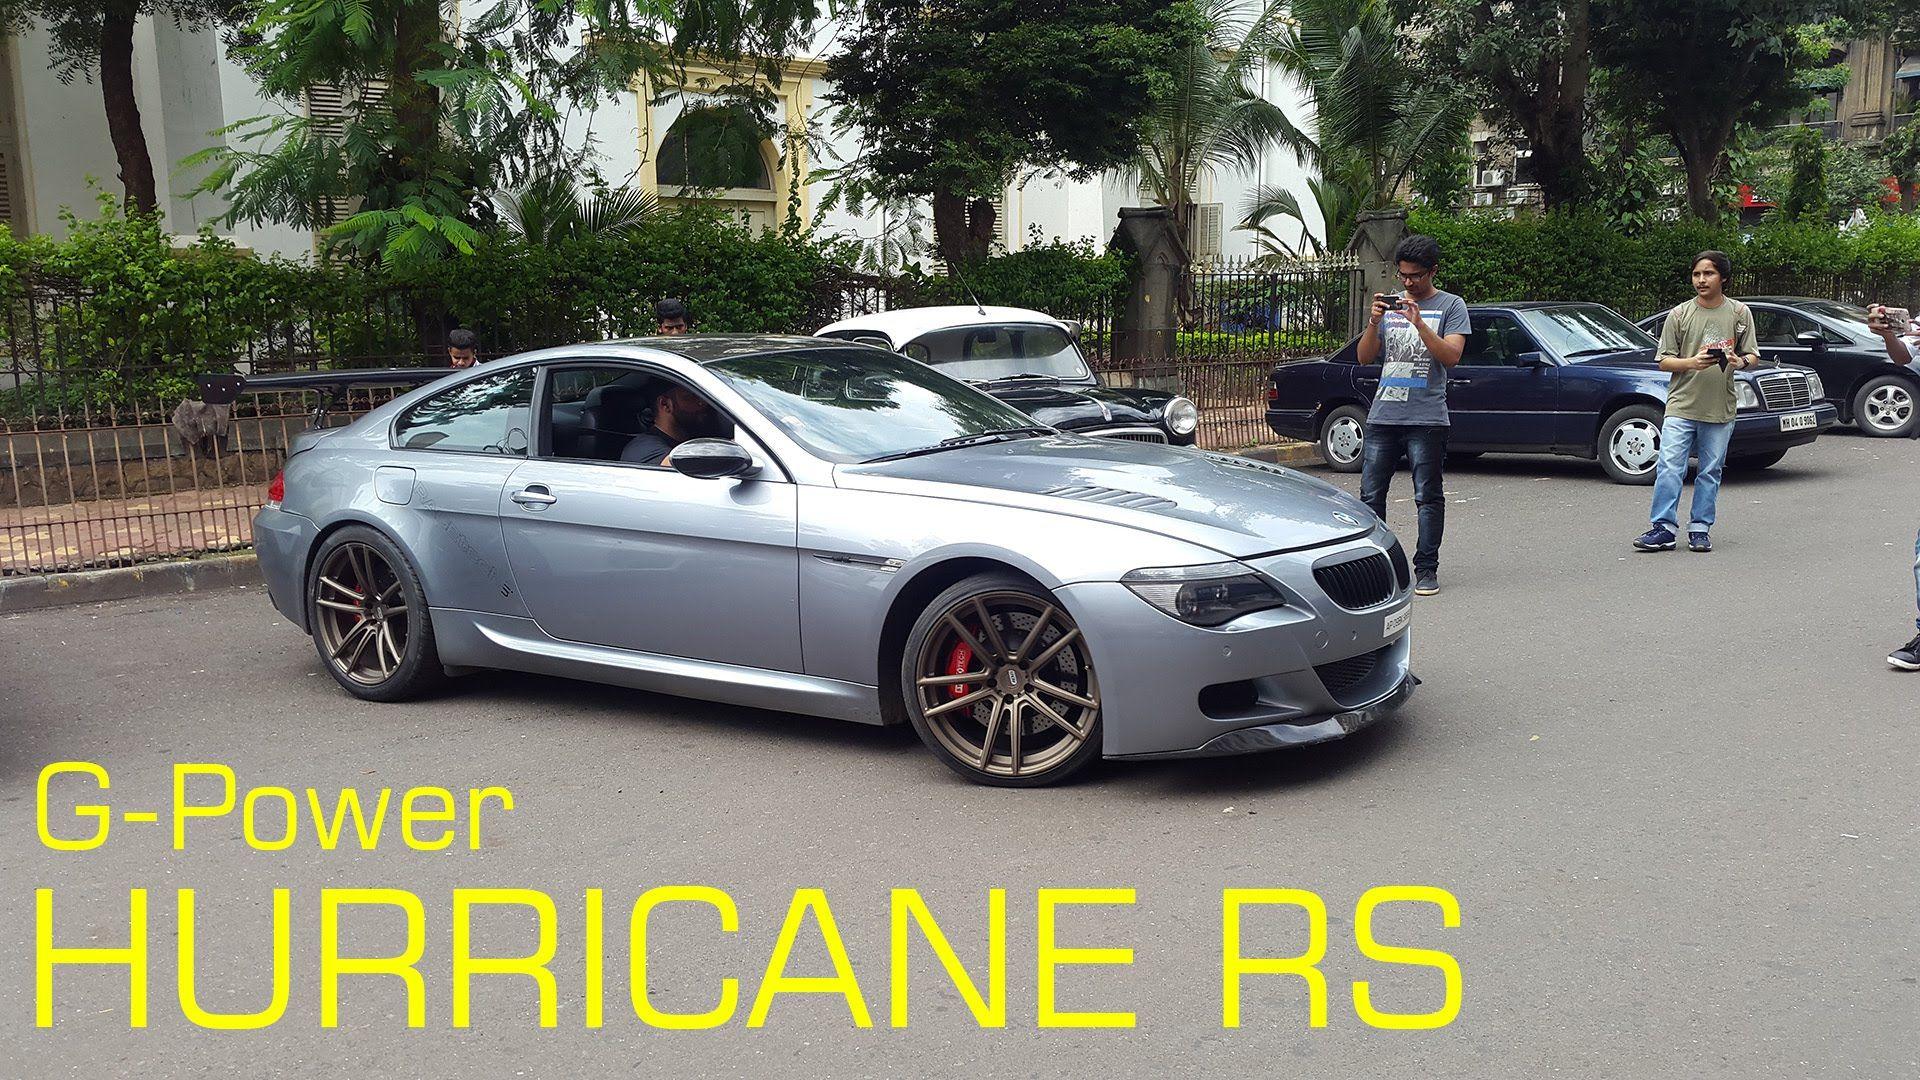 Loudest Bmw E63 M6 G Power Hurricane Rs W Eisenmann Exhaust Youtube Bmw Bmw Cars Bmw Car